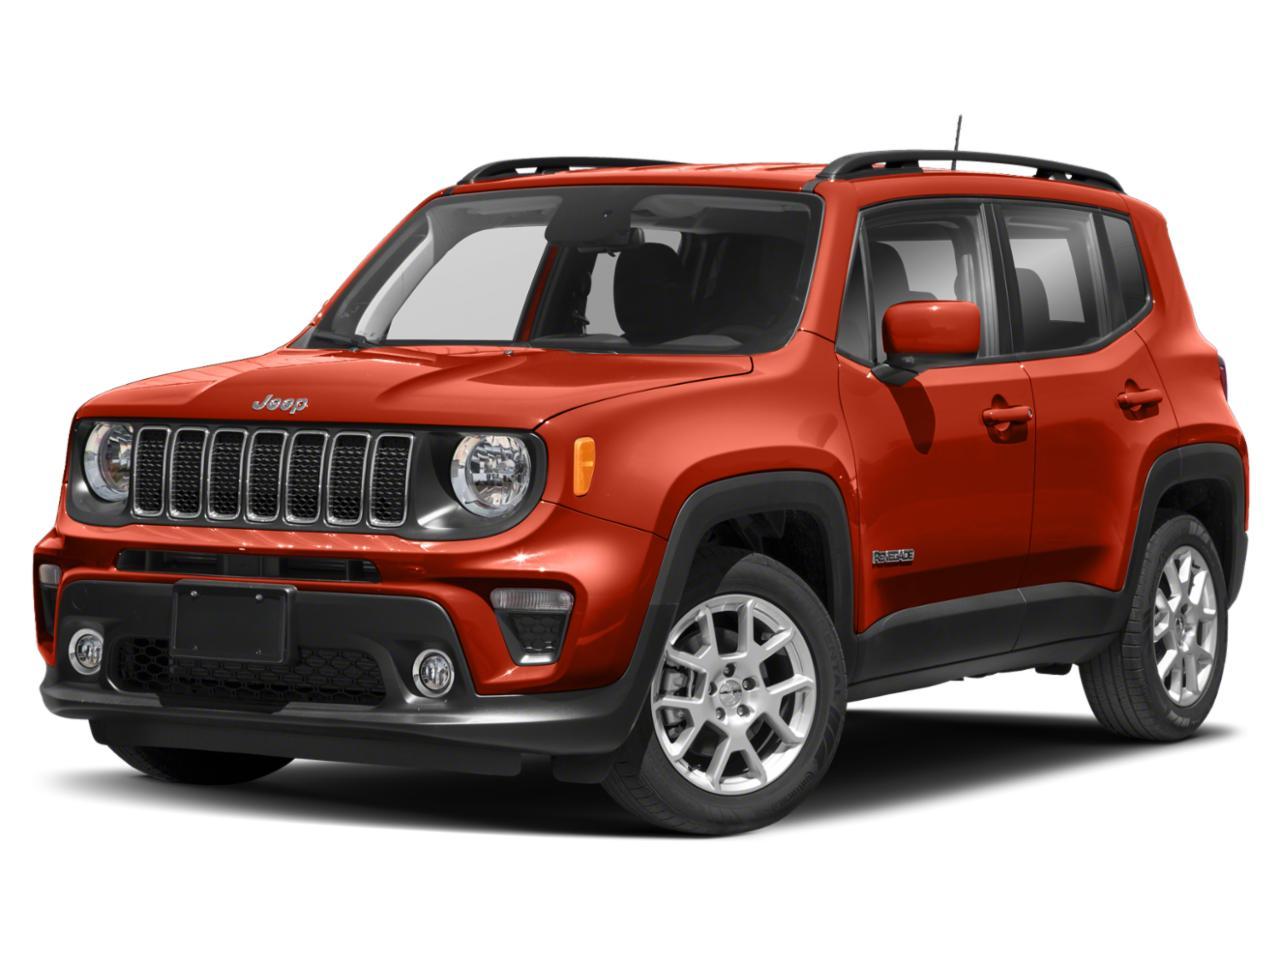 2019 Jeep Renegade Vehicle Photo in Oshkosh, WI 54904